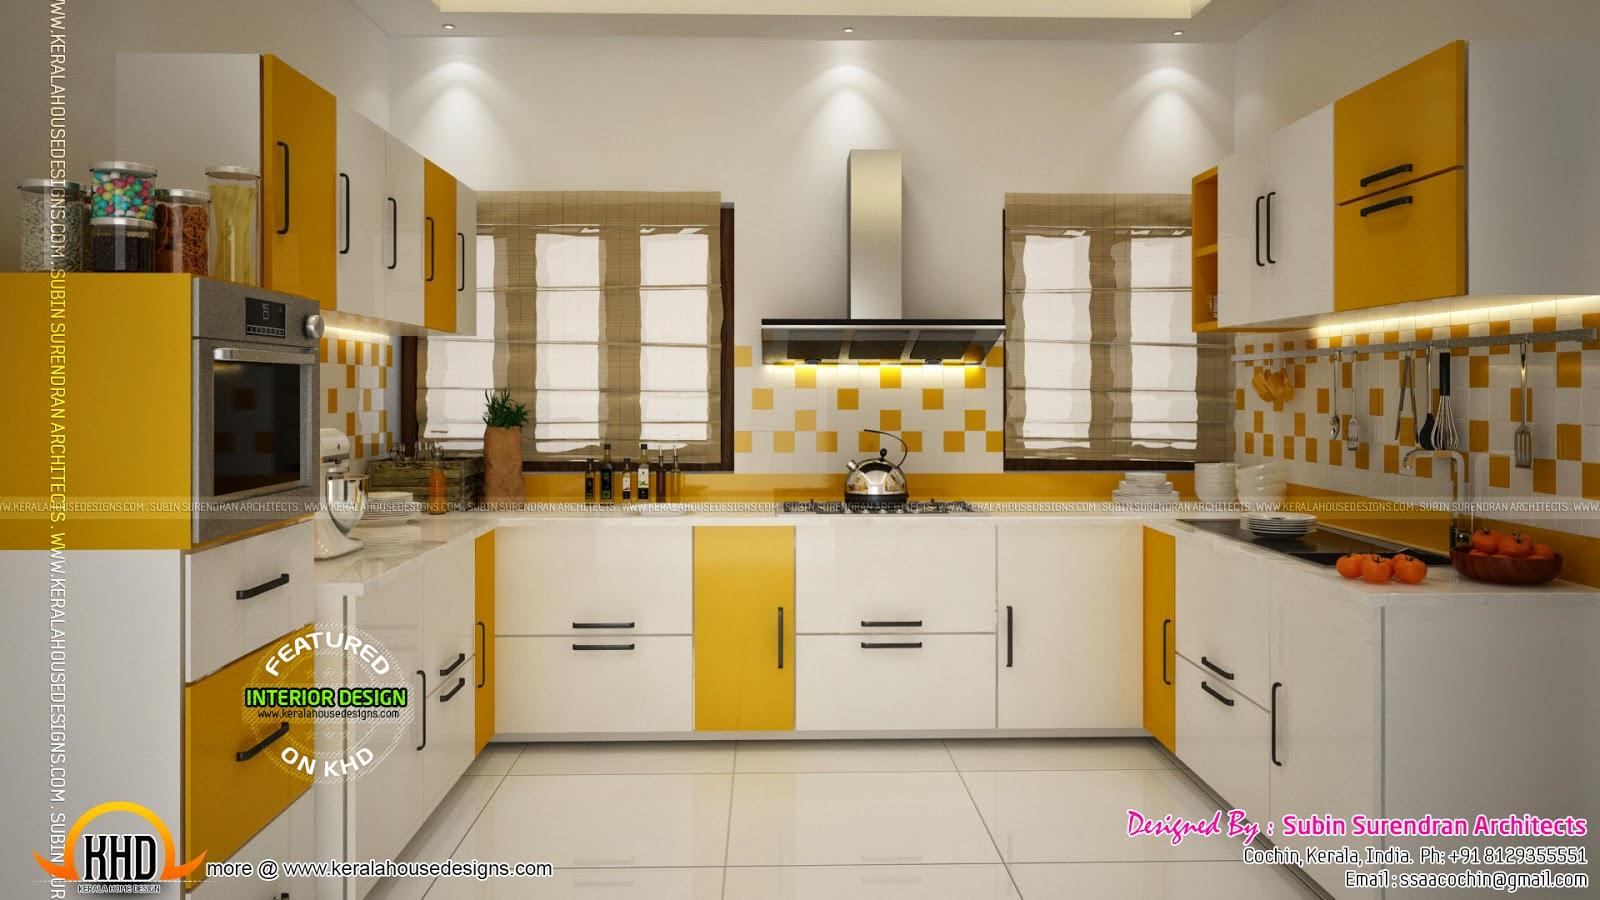 Interior Design Cochin Kerala Home Design And Floor Plans 8000 Houses